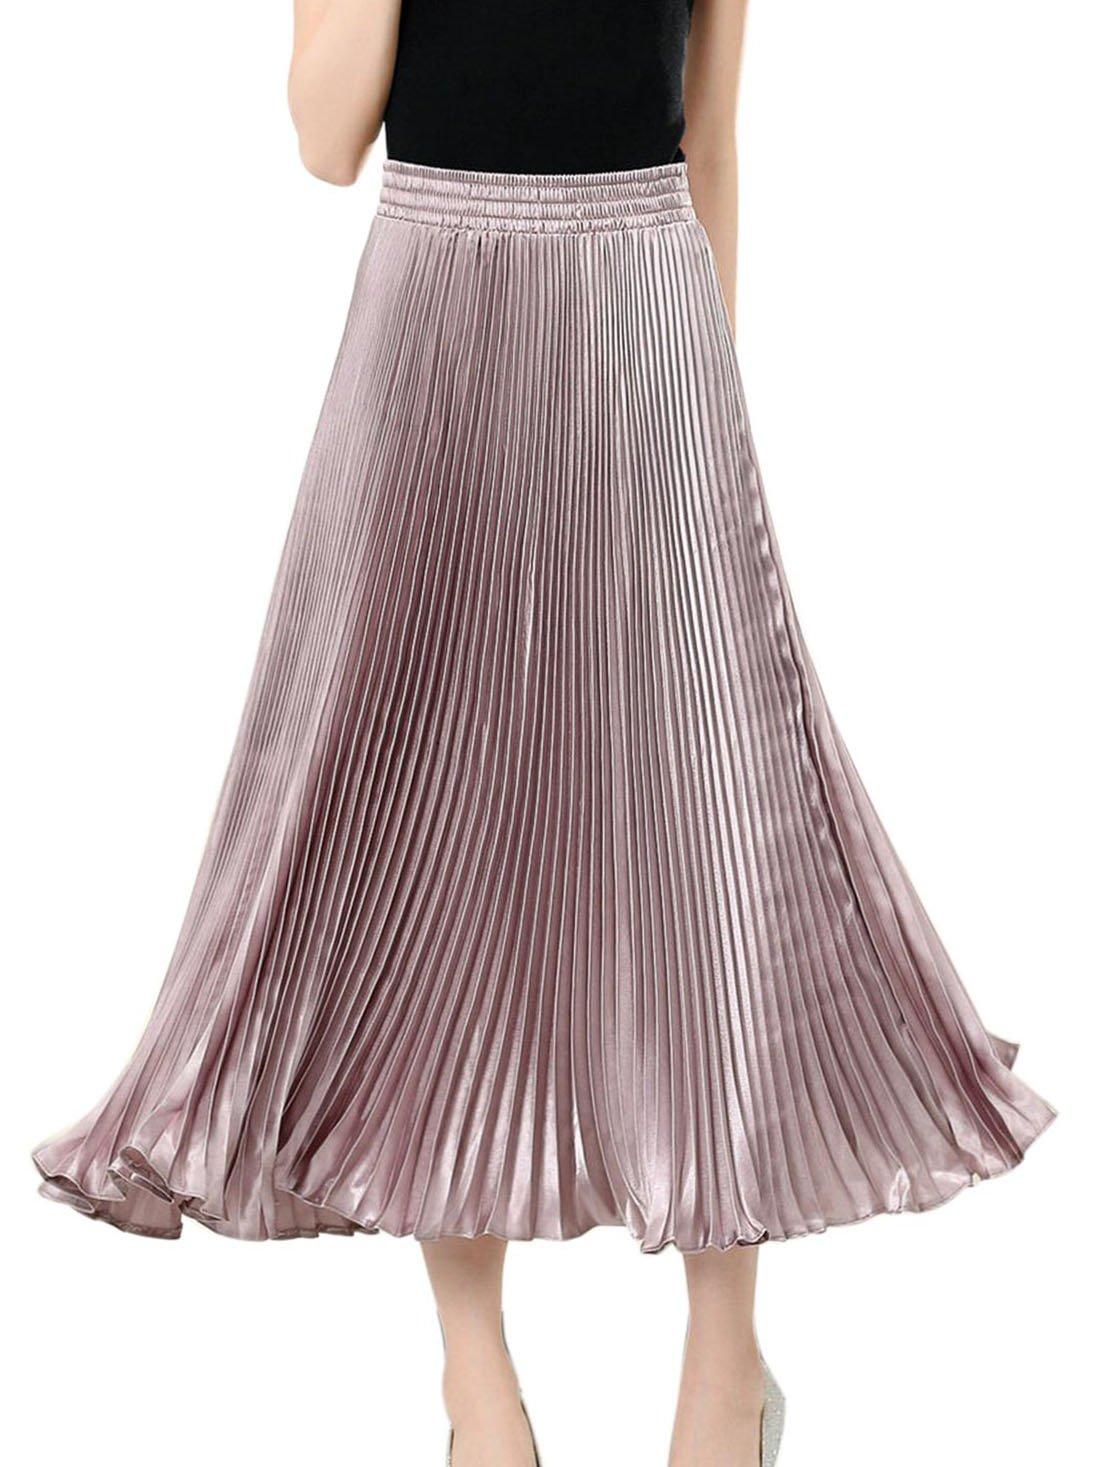 Aivtalk Women Metallic Luster Pleated Skirt Punk Elastic A-line Skirts Dress One Size Pink